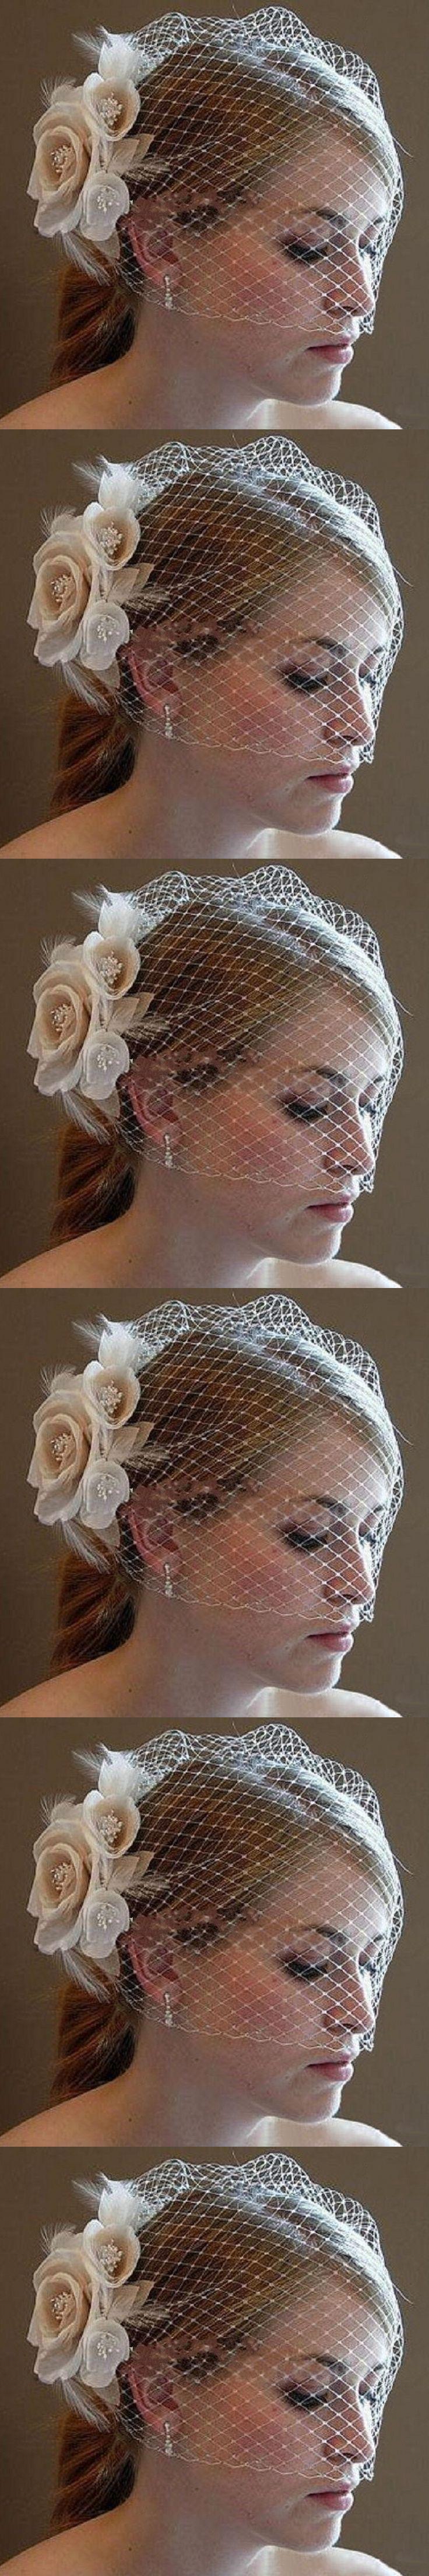 Hot Sale 2017 Wedding Birdcage Veils Champagne Flowers Feather Birdcage Veil Bridal Wedding Hair Pieces Bridal Accessories